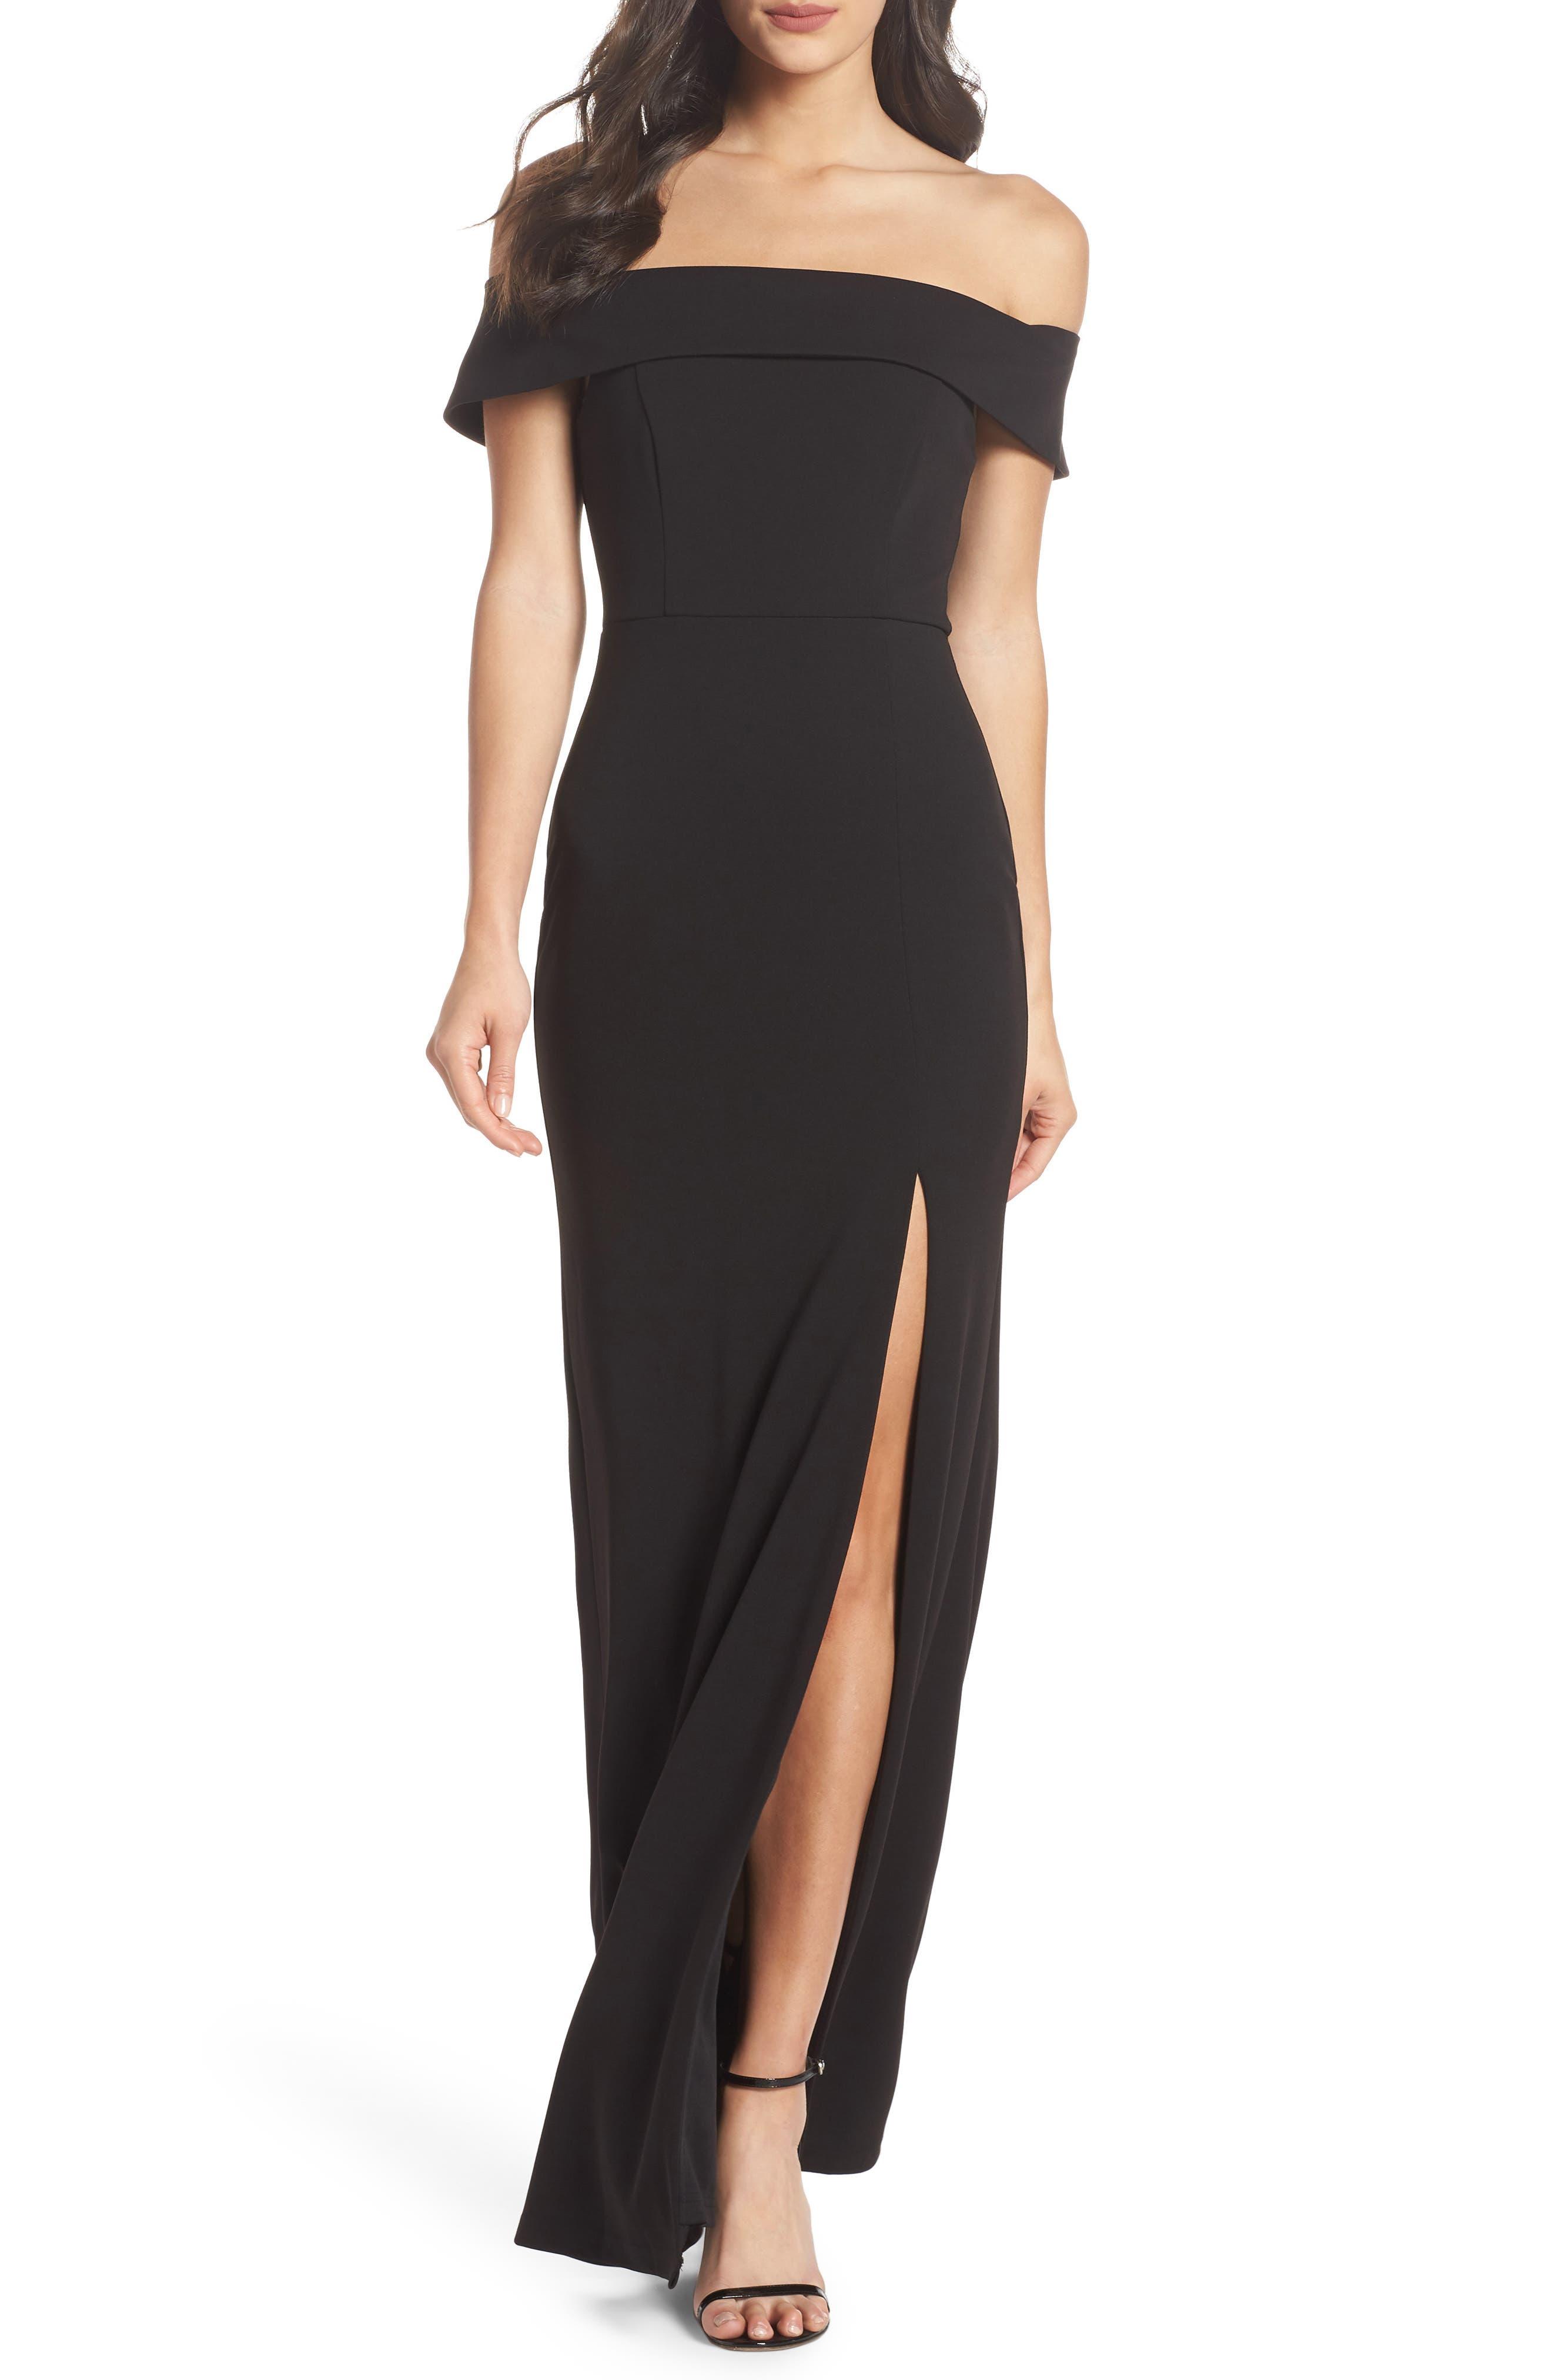 1950s Dresses, 50s Dresses | 1950s Style Dresses Womens Lulus Off The Shoulder Mermaid Gown Size X-Large - Black $94.00 AT vintagedancer.com